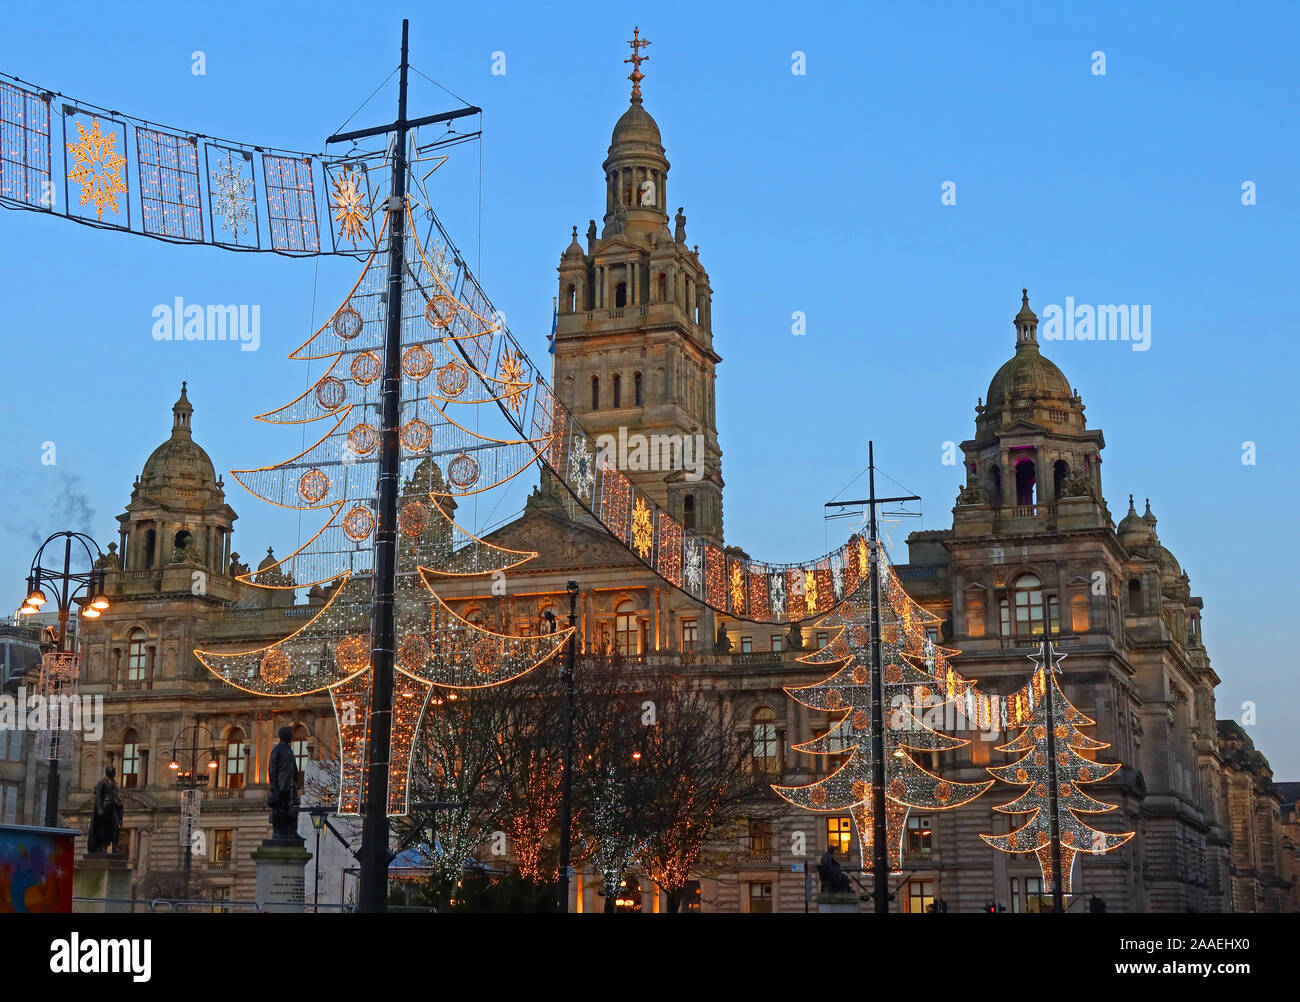 GotonySmith,UK,Scotland,Glasgow,city,city centre,HotpixUK,@HotpixUK,Xmas,Christmas,Xmas lights,decorations,street lights,Christmas Markets,Festive,street,streets,Glasgow Christmas Festive Lights,George Square,G2,G2 1DU,Glasgow City Centre,Glasgow City,centre,Glasgow Christmas,Festive Lights,tree,Christmas Tree